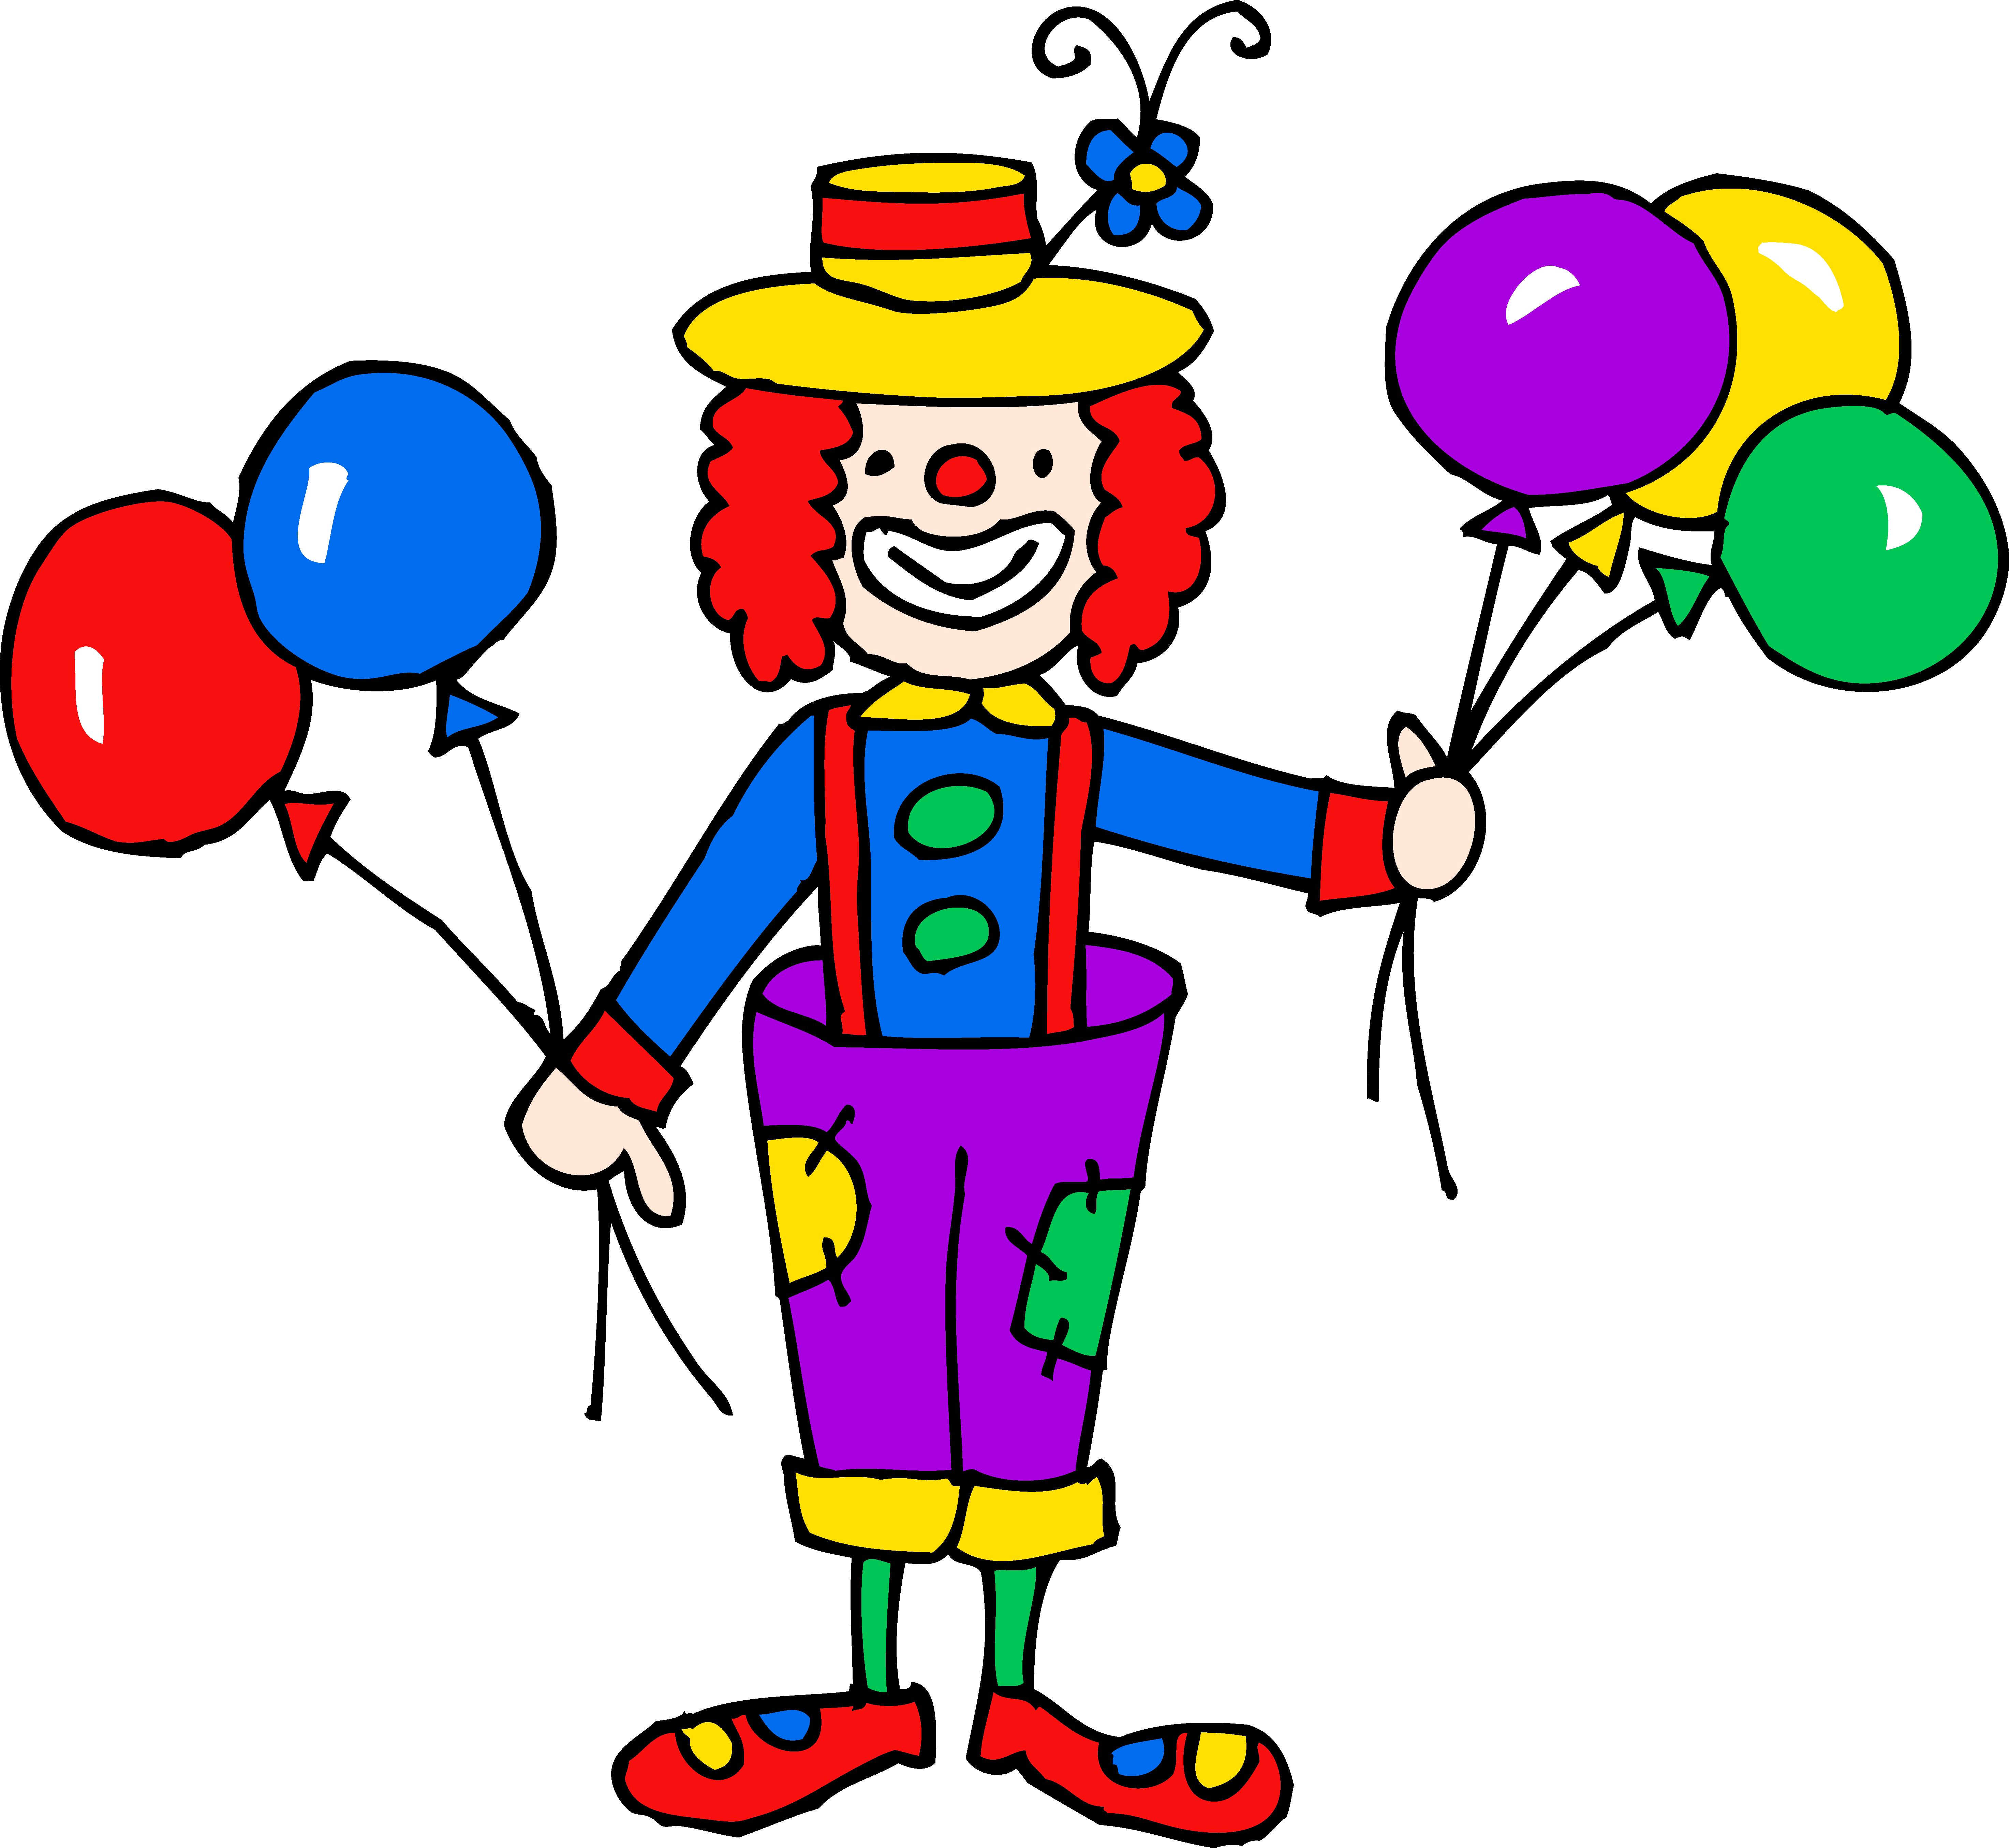 Joker clipart #1, Download drawings